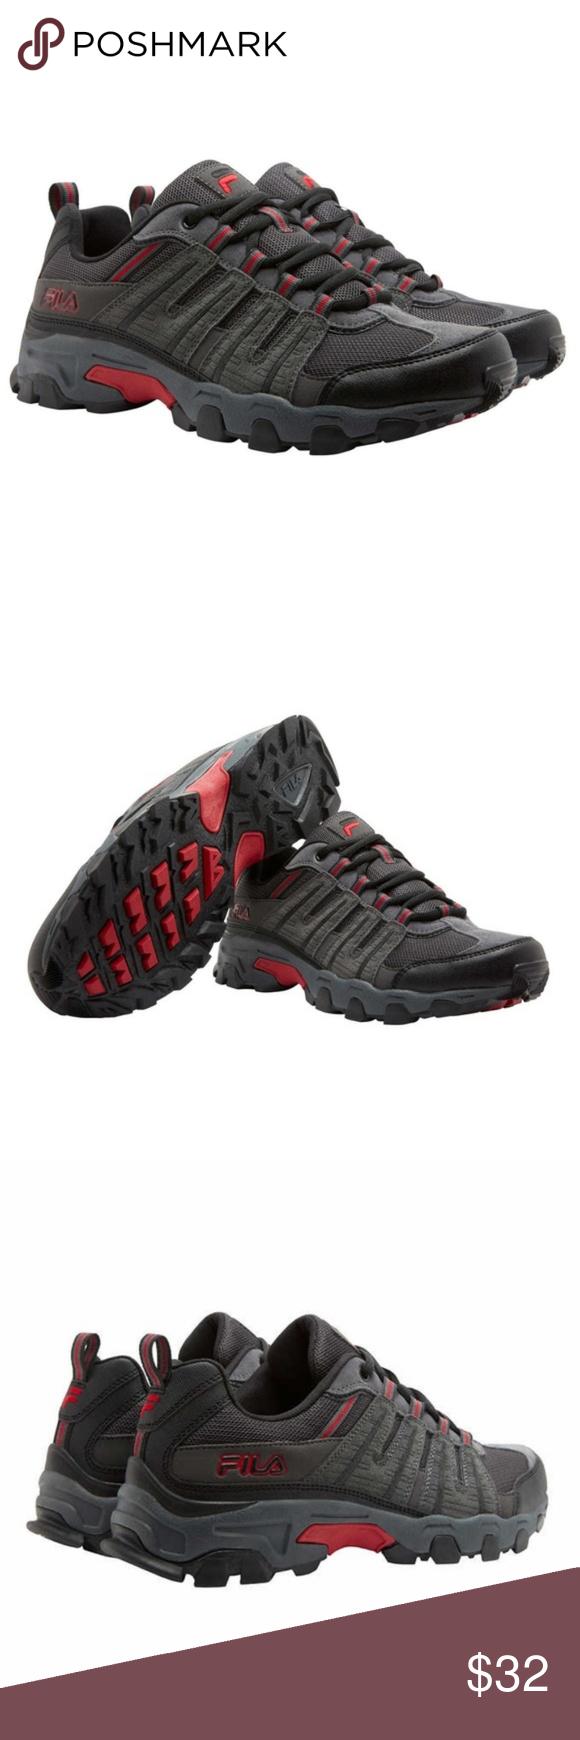 Fila Mens WESTMOUNT Leather Hiking Sneakers B Fila WESTMOUNT